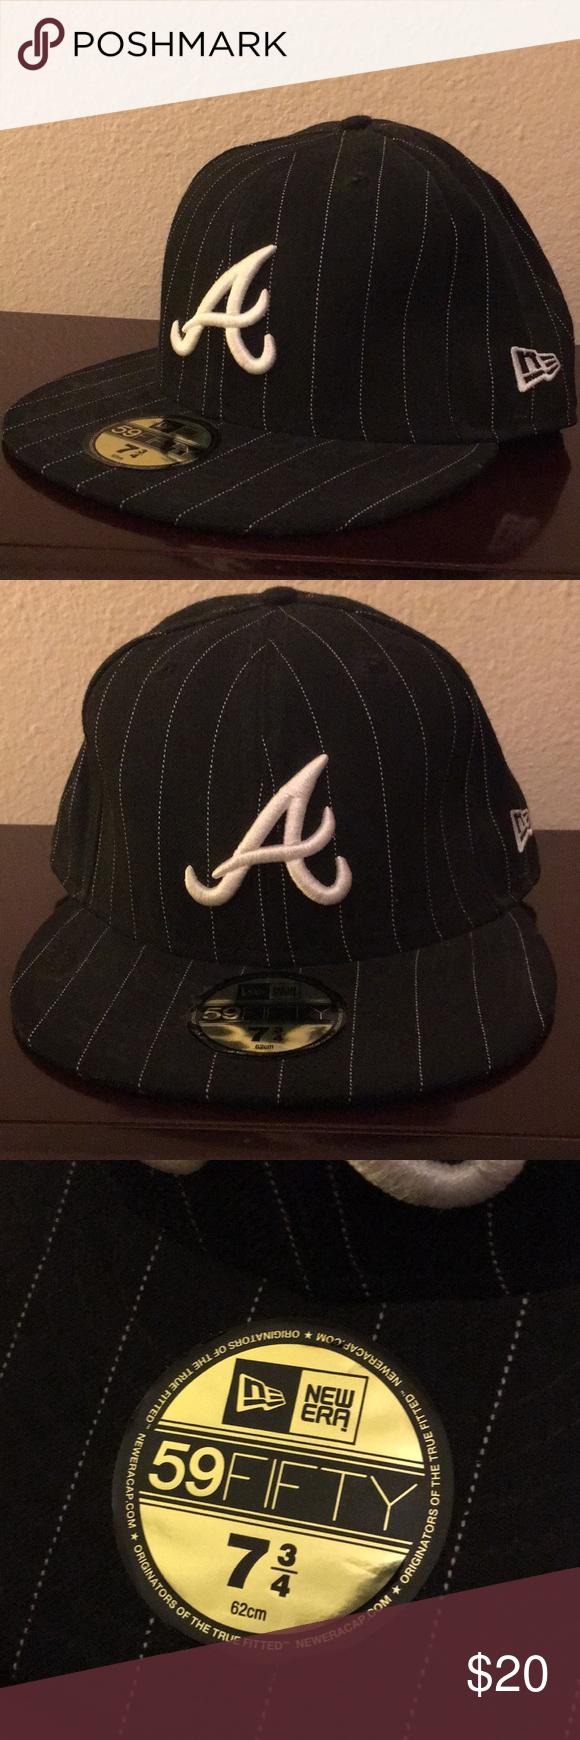 Atlanta Braves Mlb 7 3 4 Black Hat Cap Fitted Men S Fitted Cap By New Era Size 7 3 4 62 Cm Atlanta Braves Black Pinstripes Cap Pr Atlanta Braves Black Braves